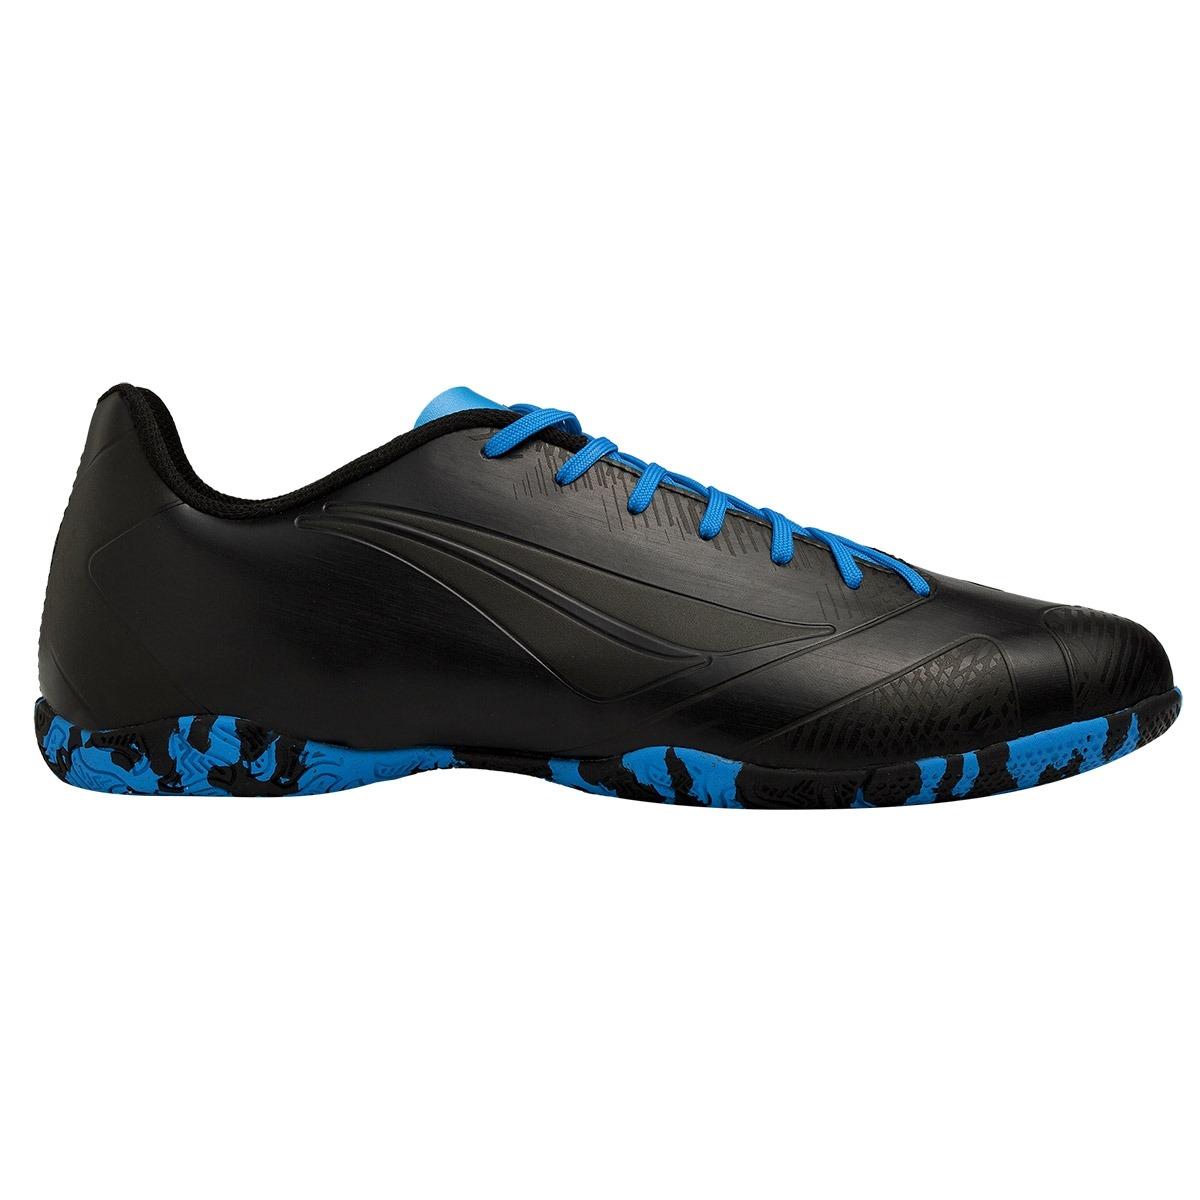 chuteira futsal penalty victoria rx vi preto azul. Carregando zoom. b4ea29dcc2558